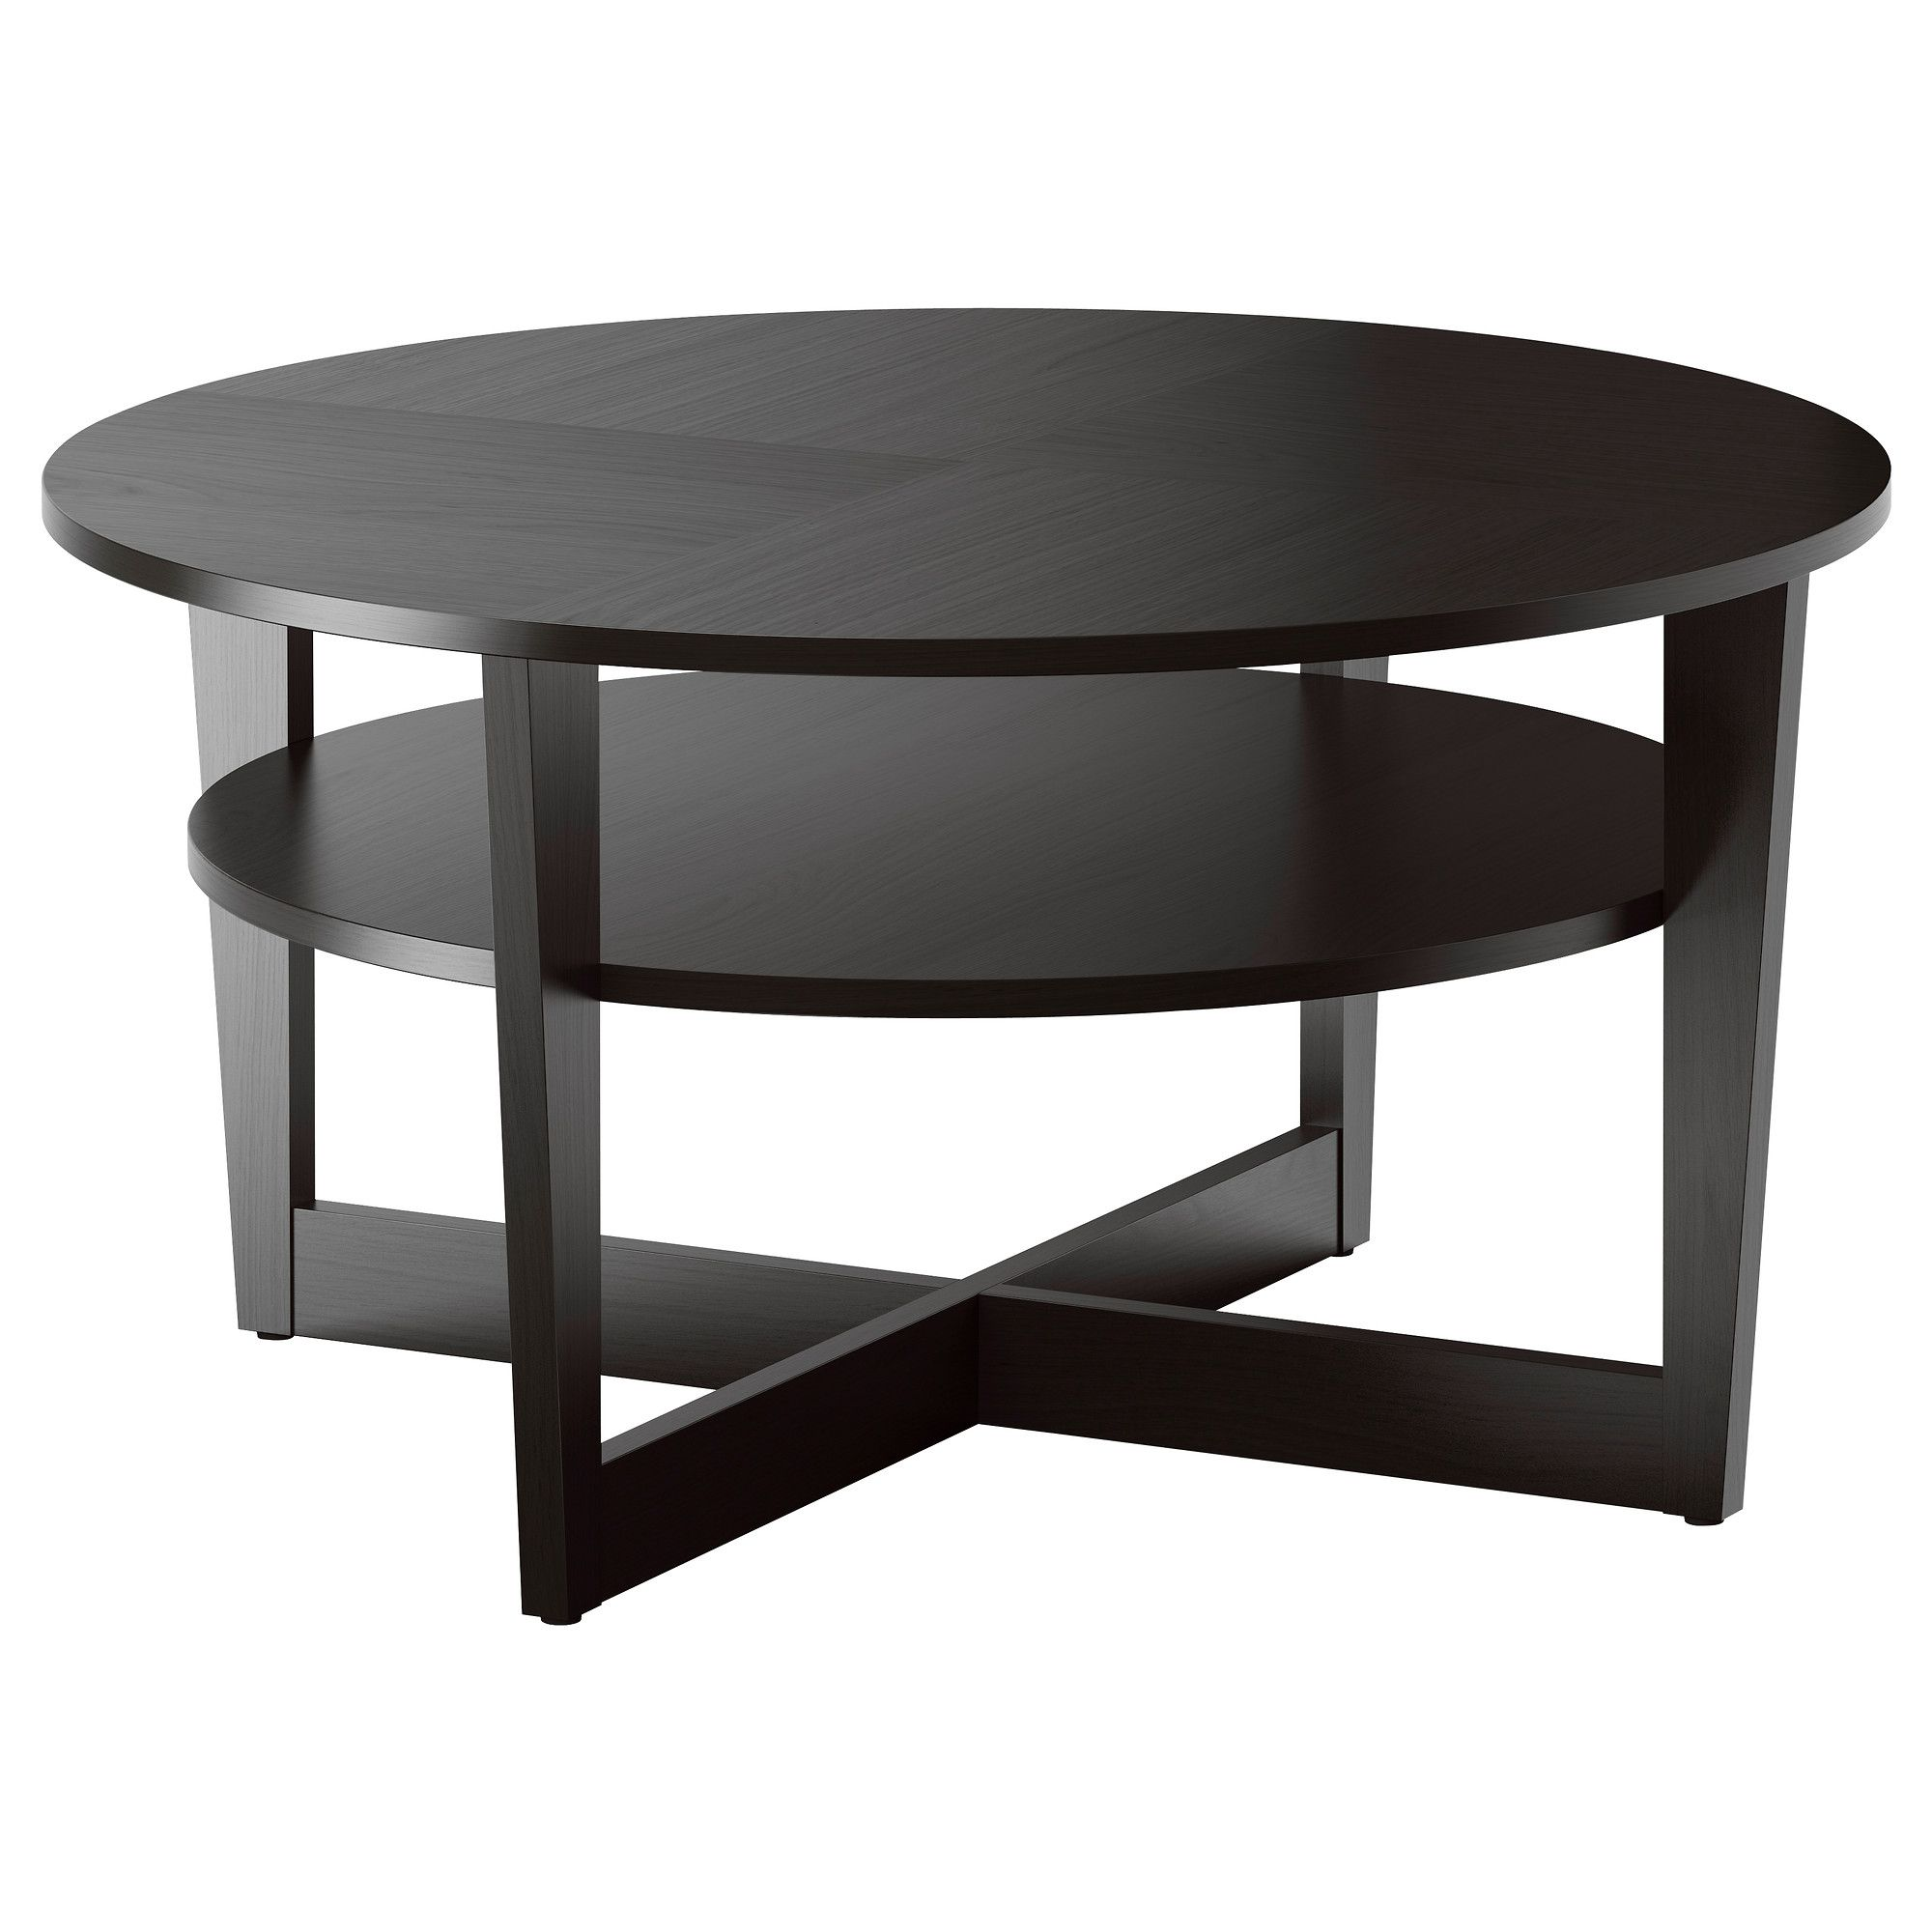 Vejmon Coffee Table Black Brown 35 3 8 90 Cm Ikea Coffee